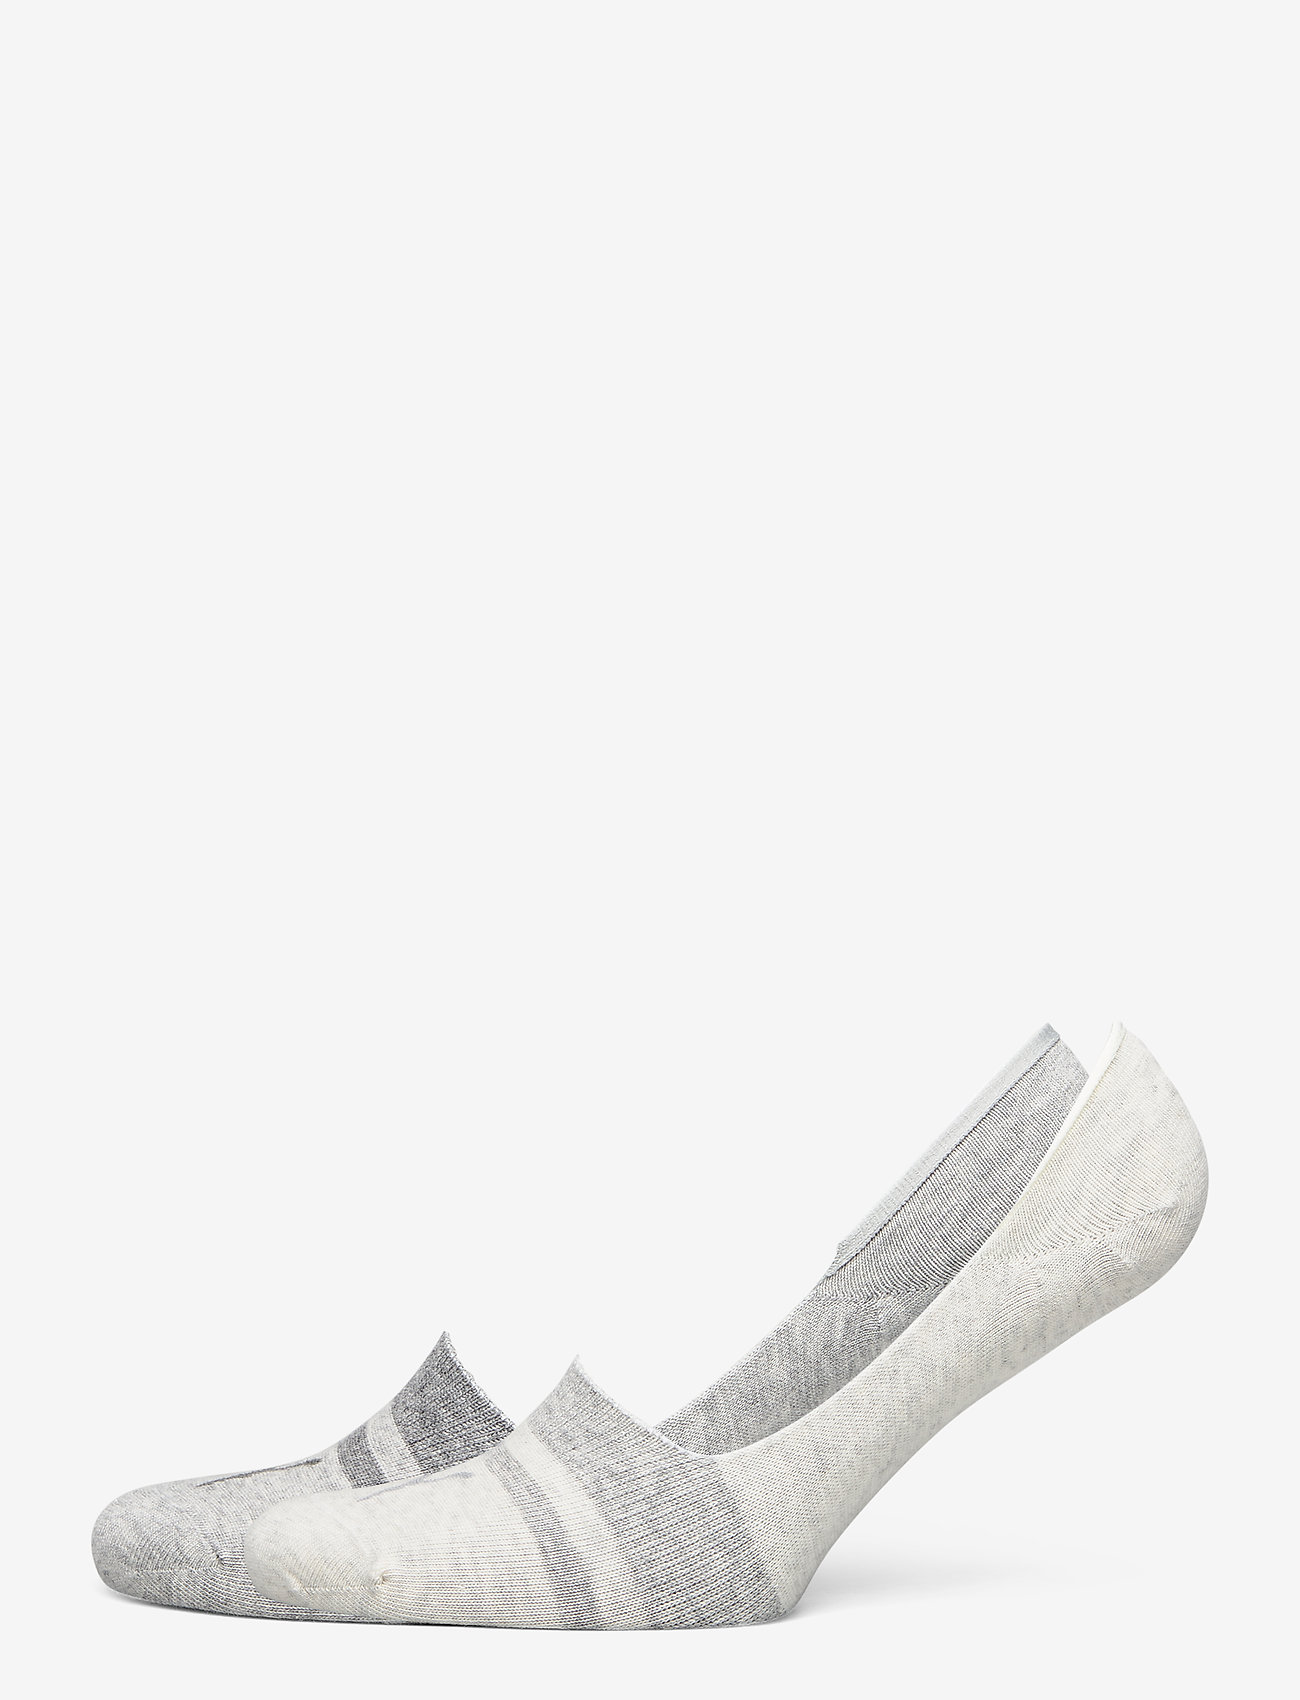 PUMA - PUMA HERITAGE FOOTIE 2P UNISEX - kousen - light grey melange - 0